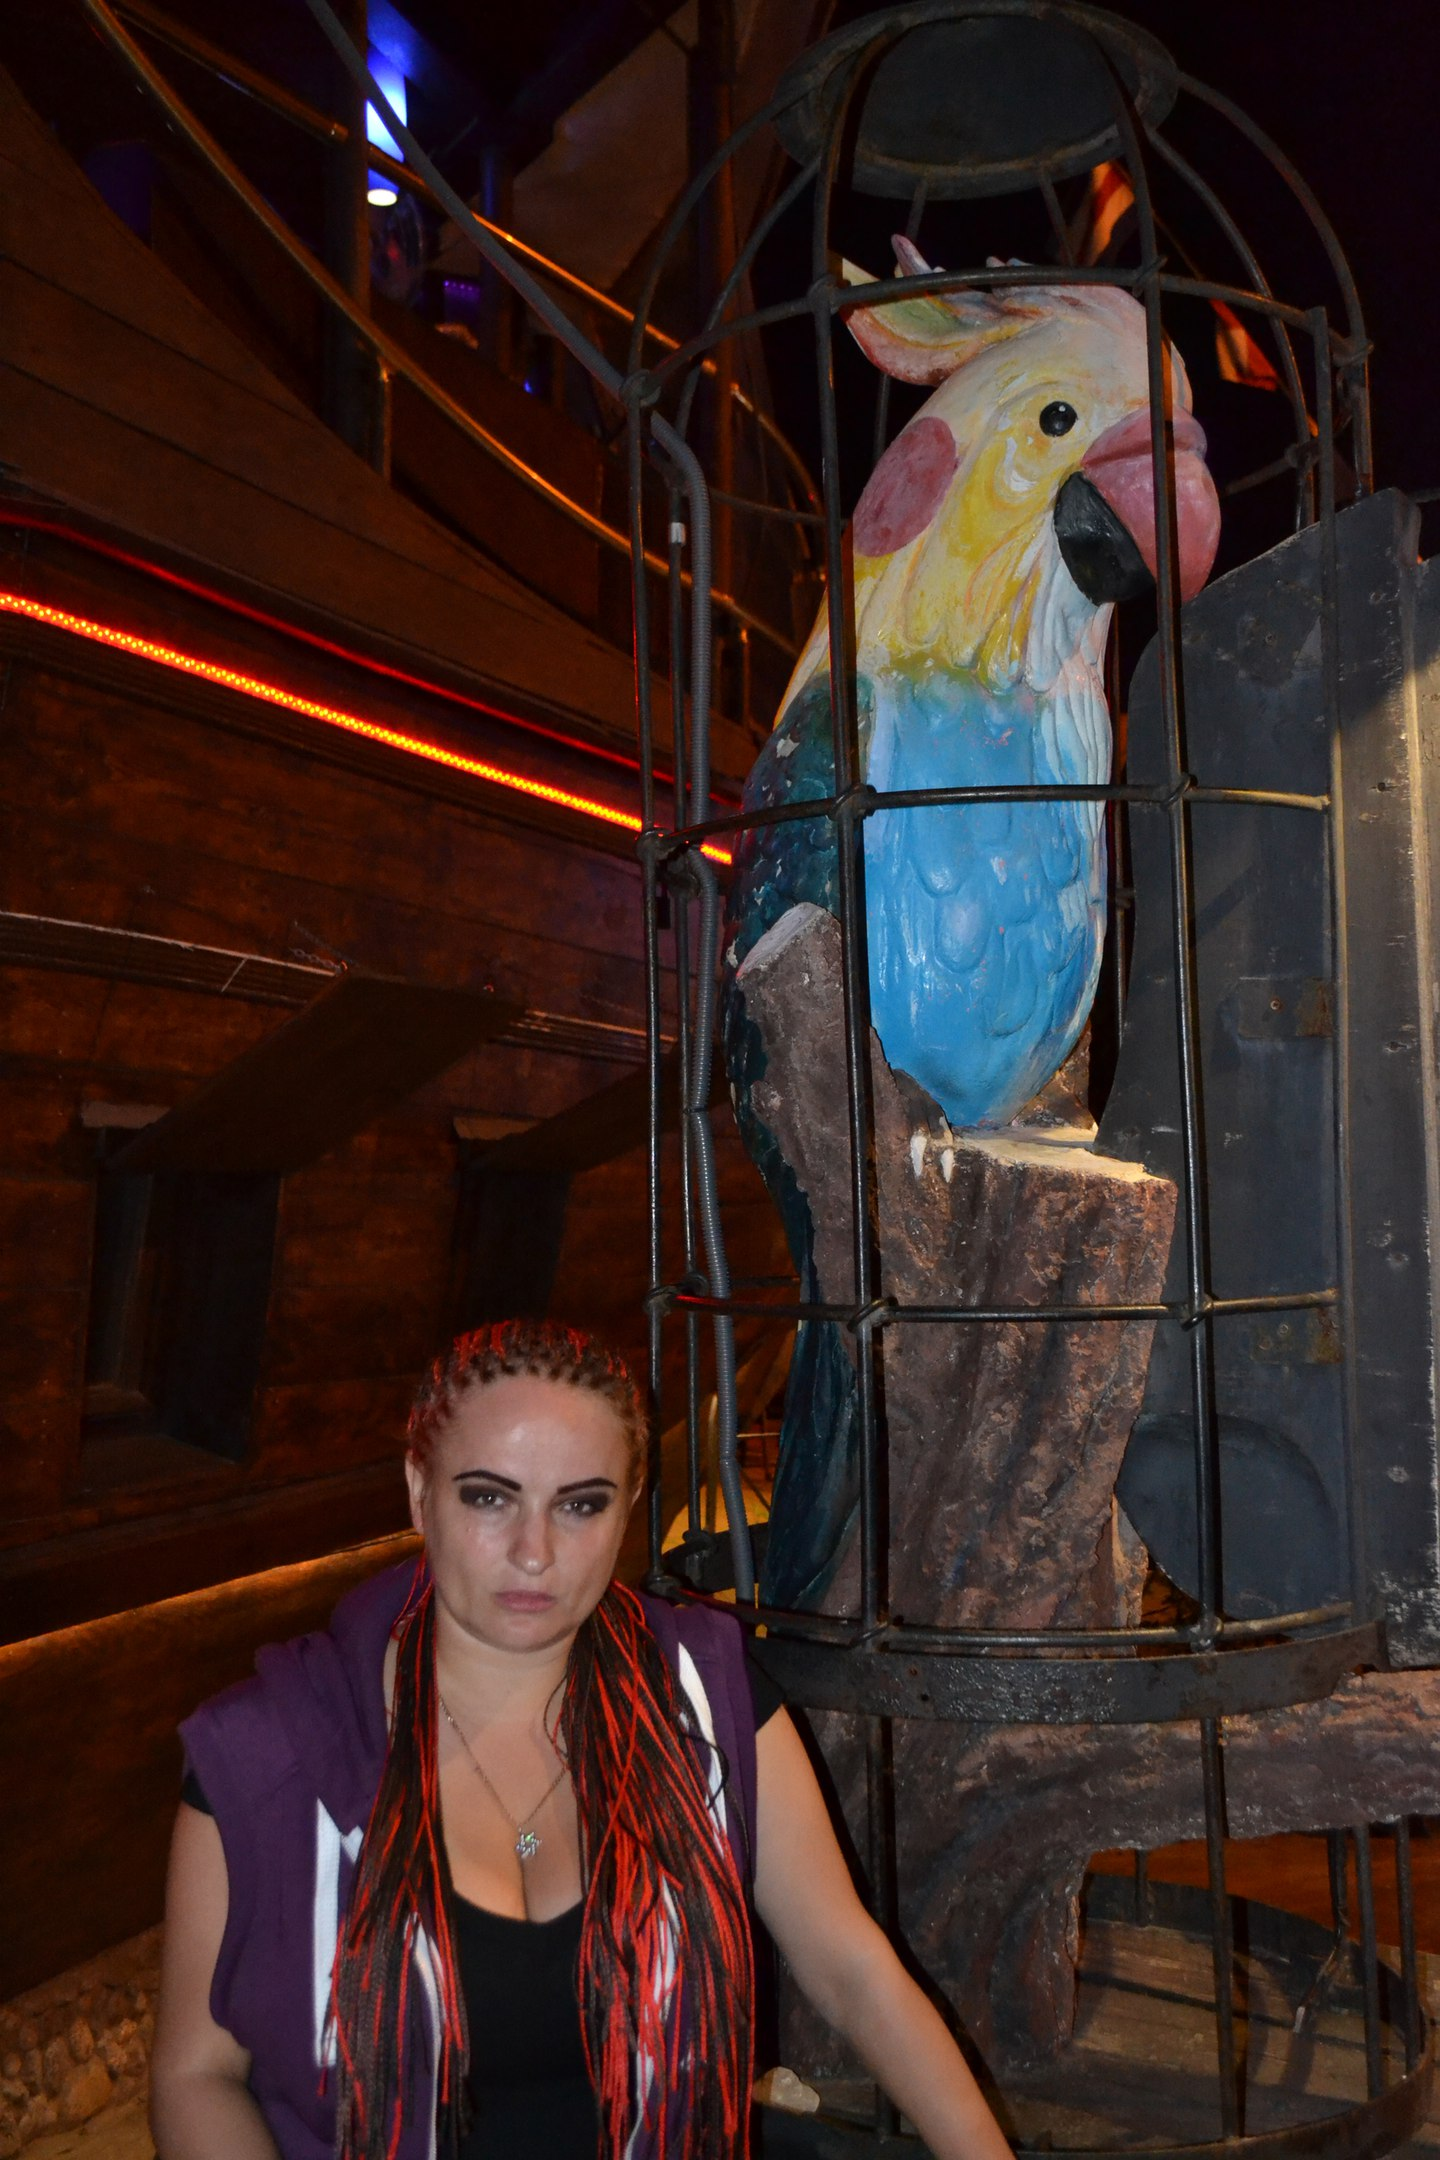 Елена Руденко (Валтея) Украина. Одесса. 17-21 августа 2016 г. - Страница 2 XY4dy97FawE